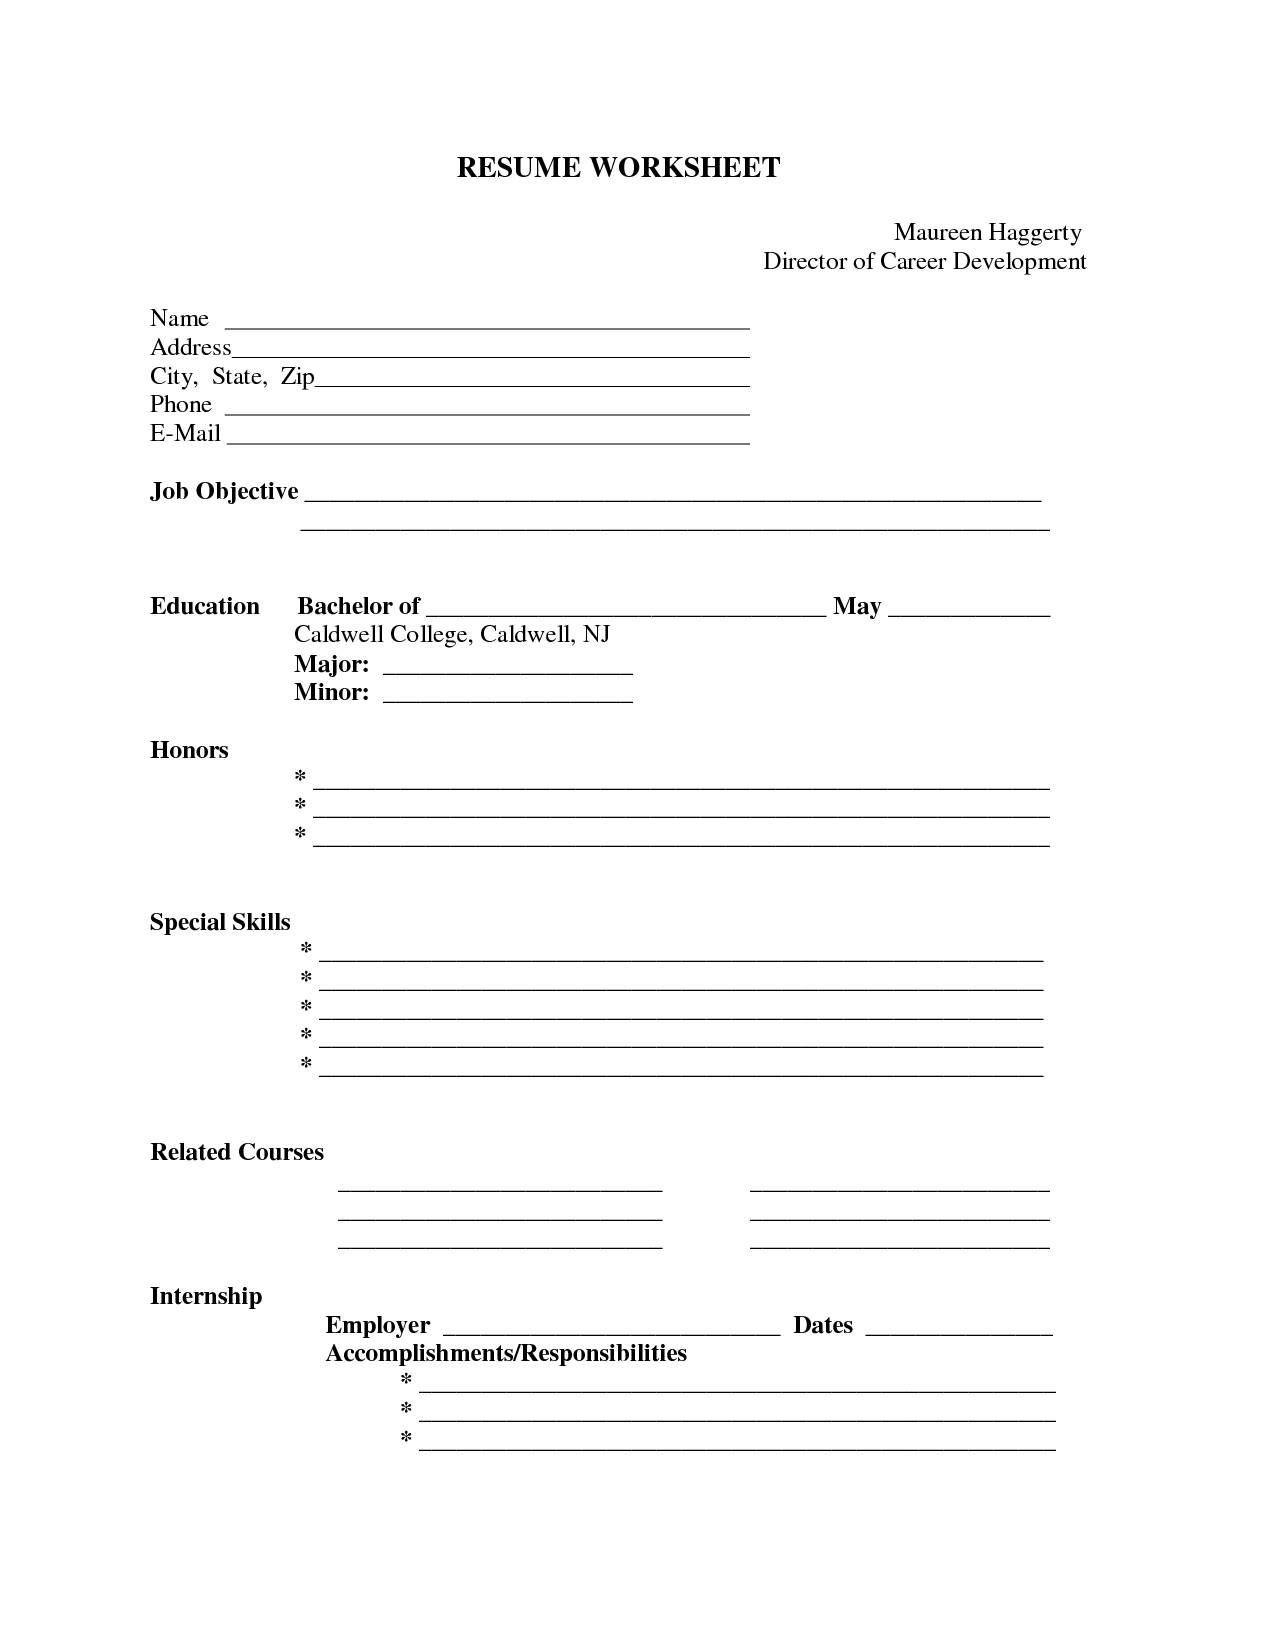 Resume Examples Printable Resume Templates Resume Form Free Printable Resume Templates Free Printable Resume